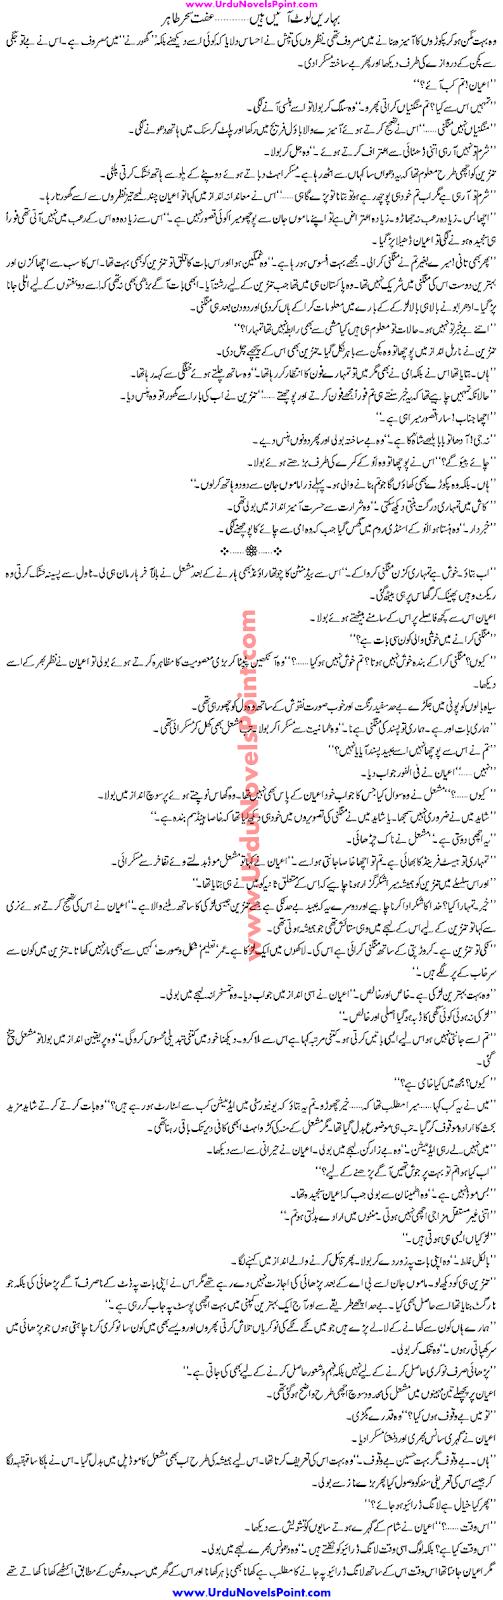 Baharain lout aai hain by Iffat Sehar Tahir